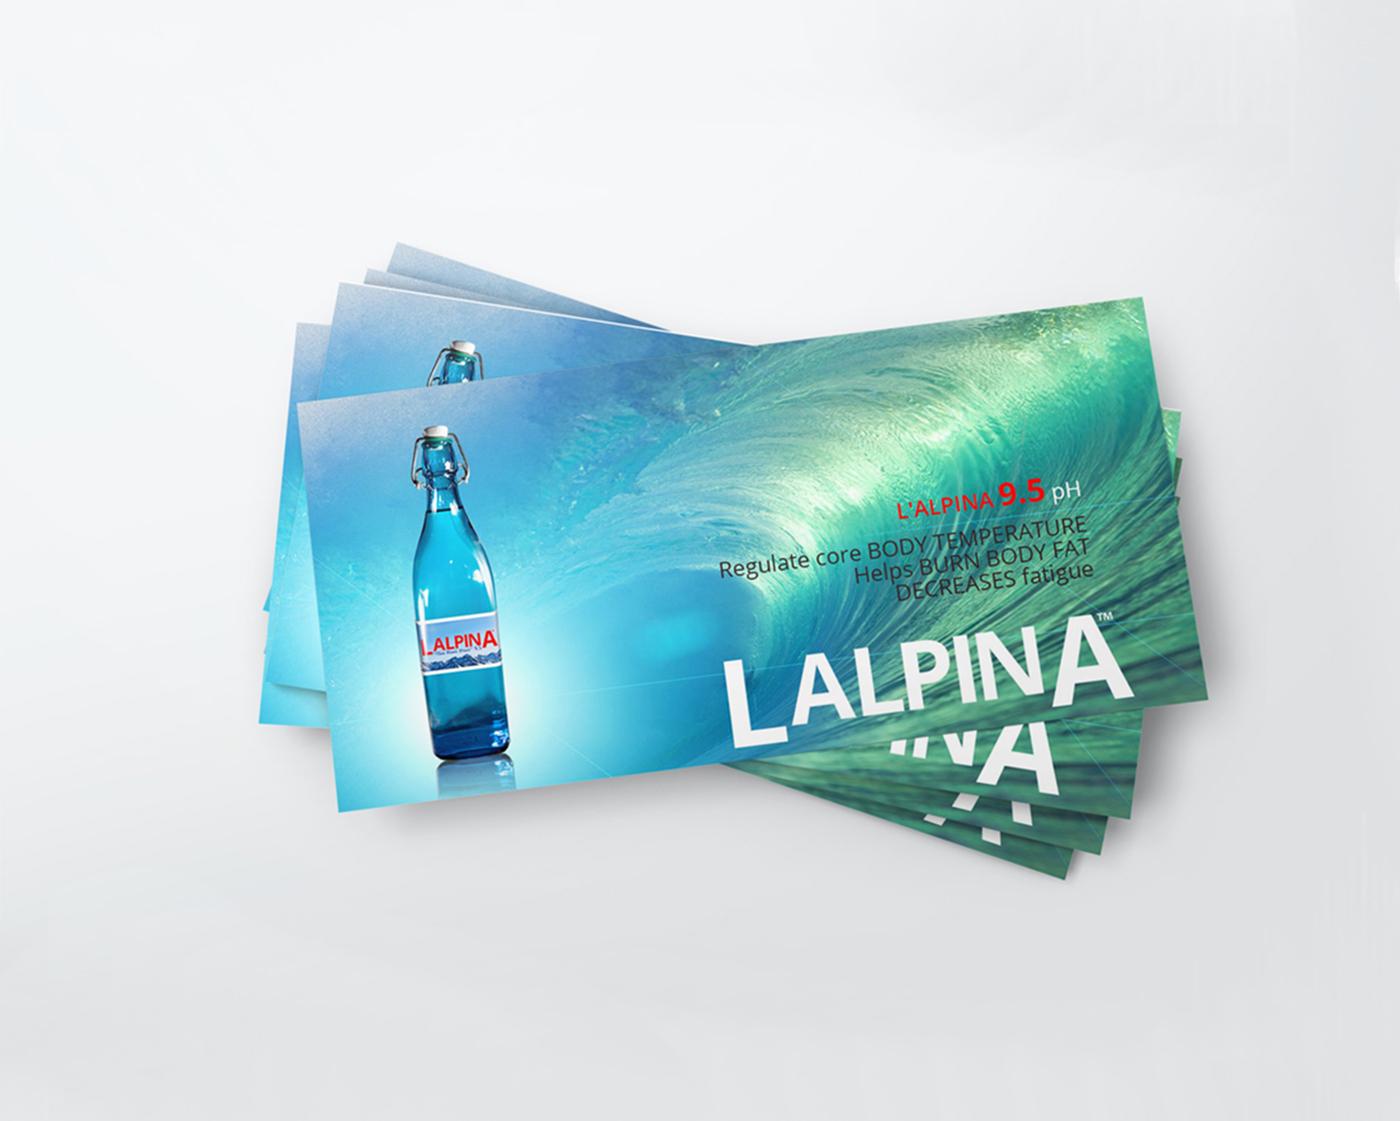 Lalpina – Design